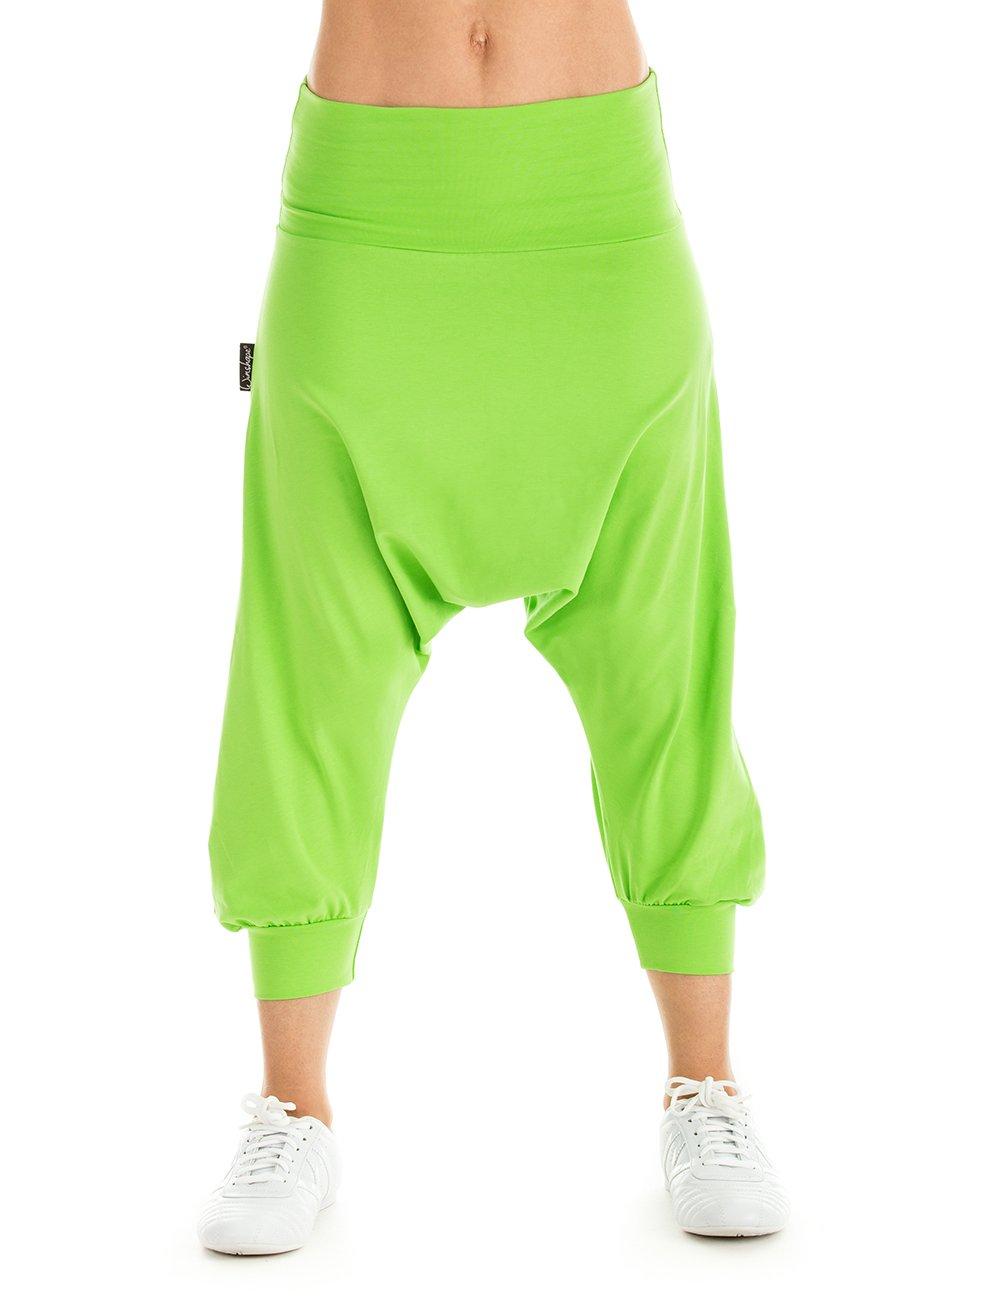 Ropa Winshape Deporte Para Mujer Dance Para Fitness Y Uso Cotidiano Sport Pantalones De Haren Deportes Y Aire Libre Brandknewmag Com